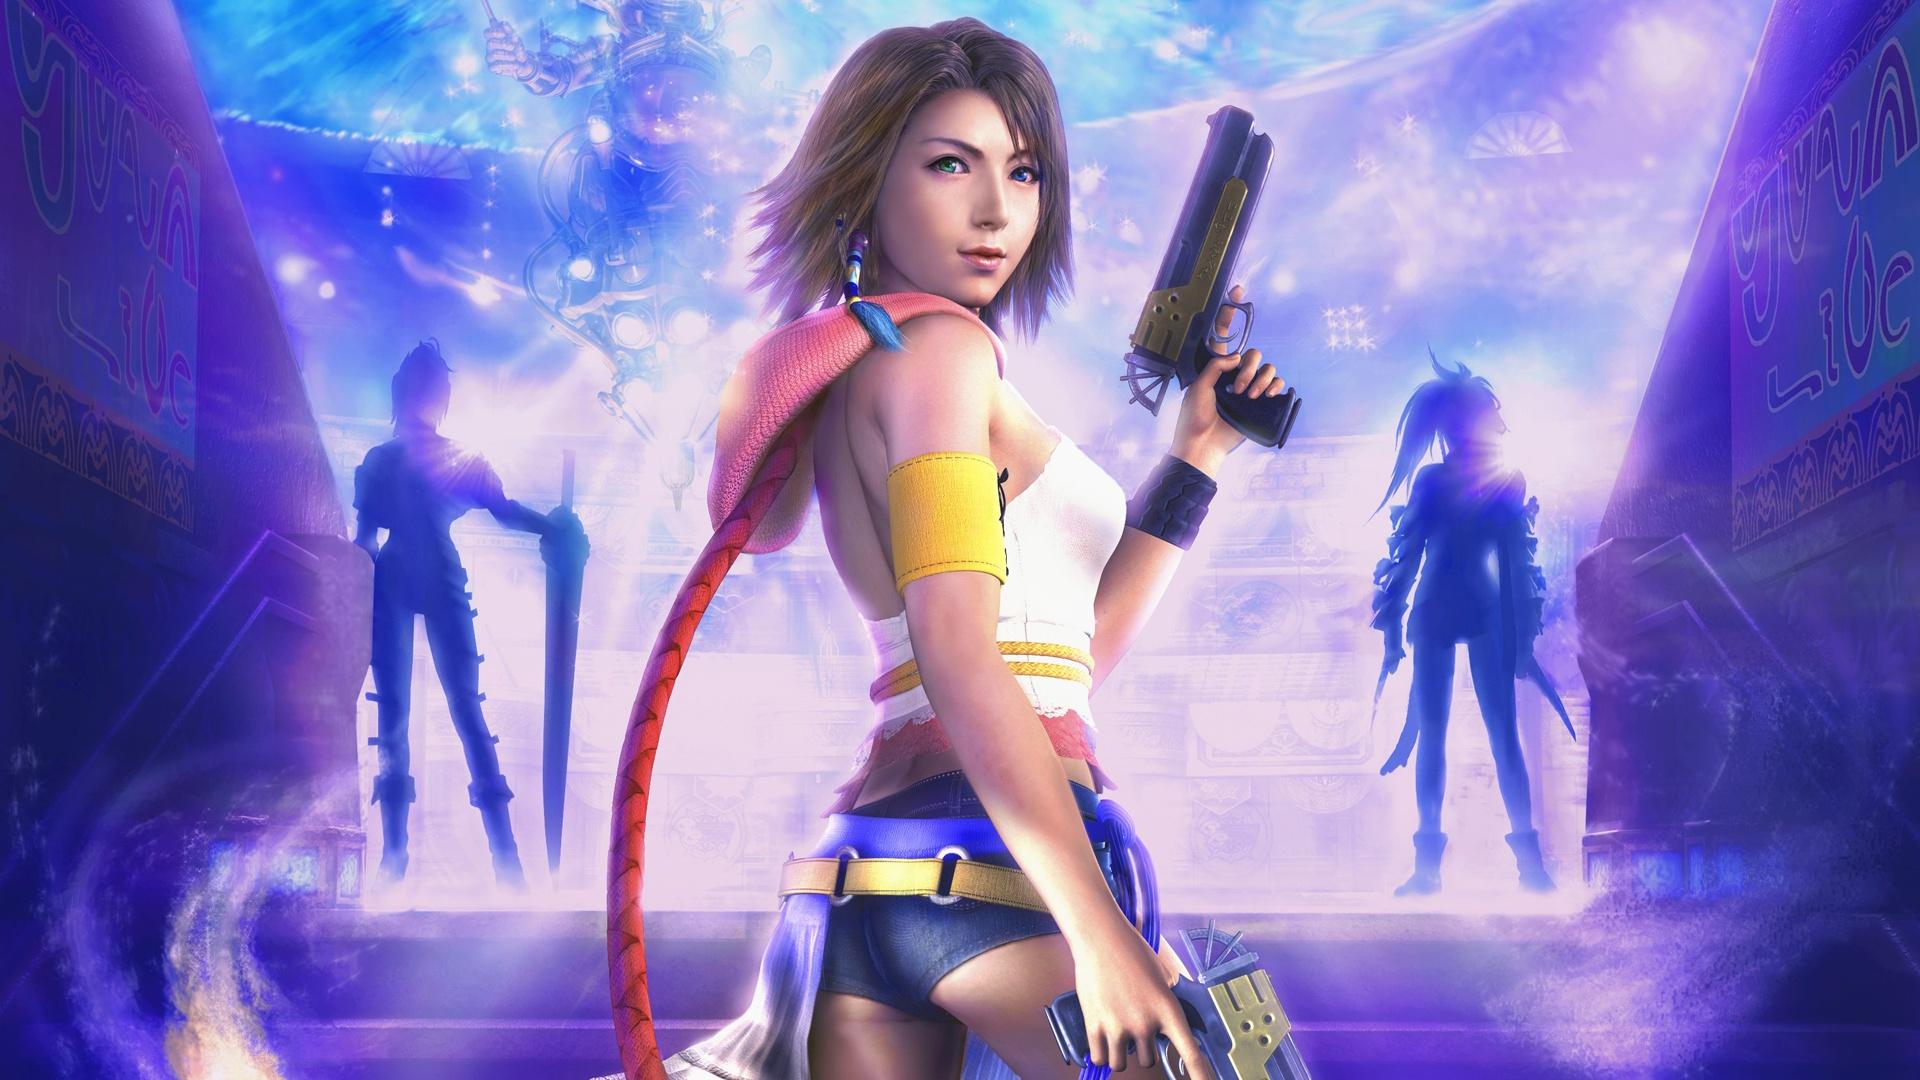 Final Fantasy best background